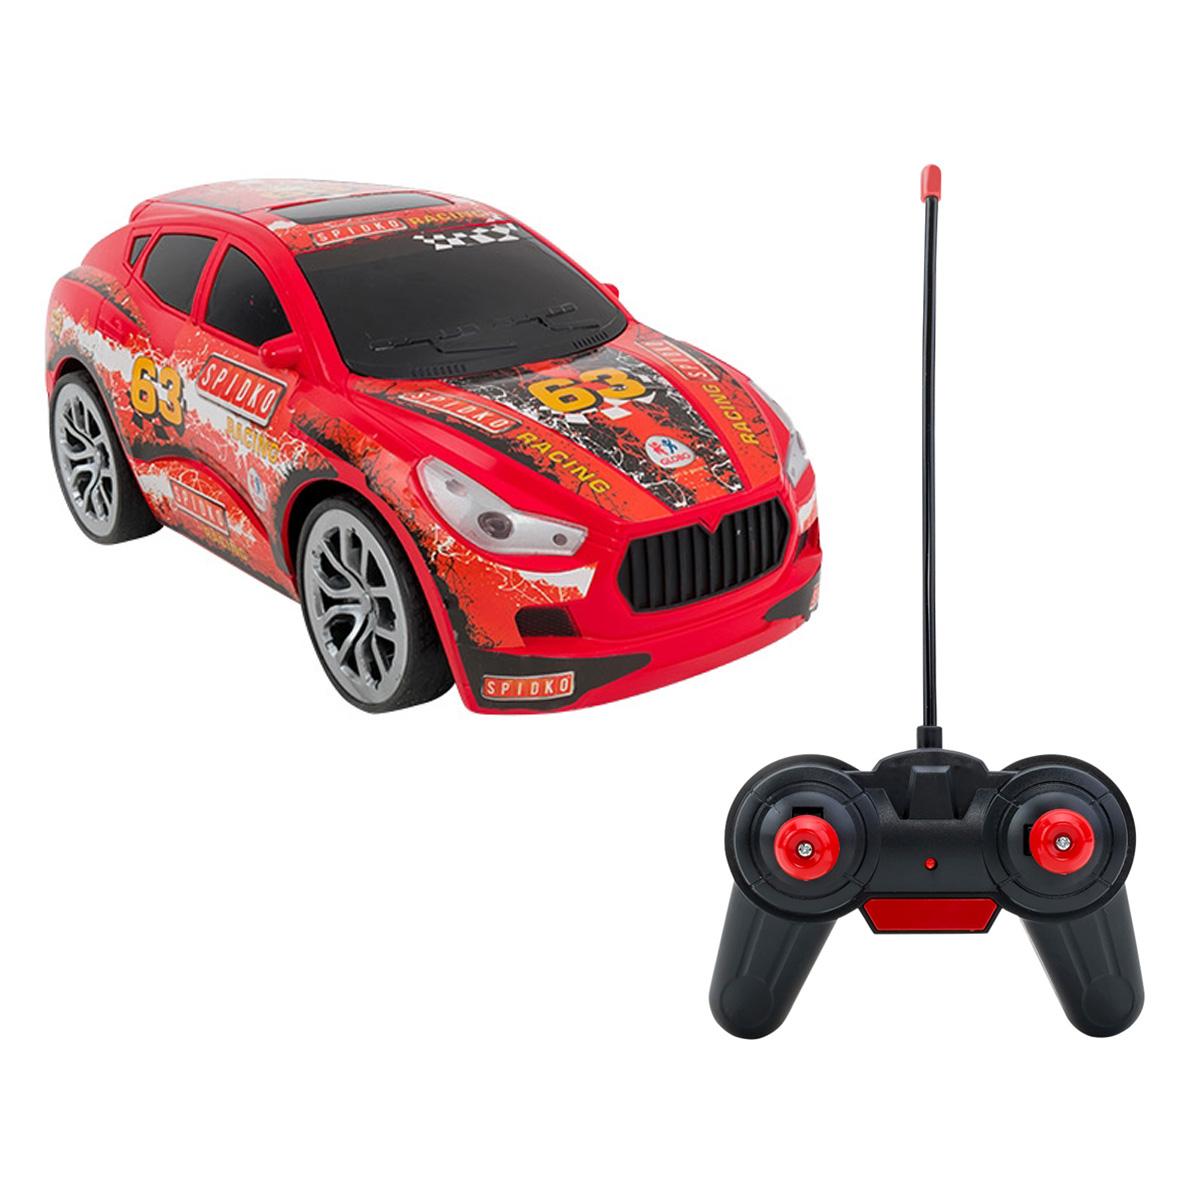 Masinuta cu telecomanda Globo Suv WRC, Rosu